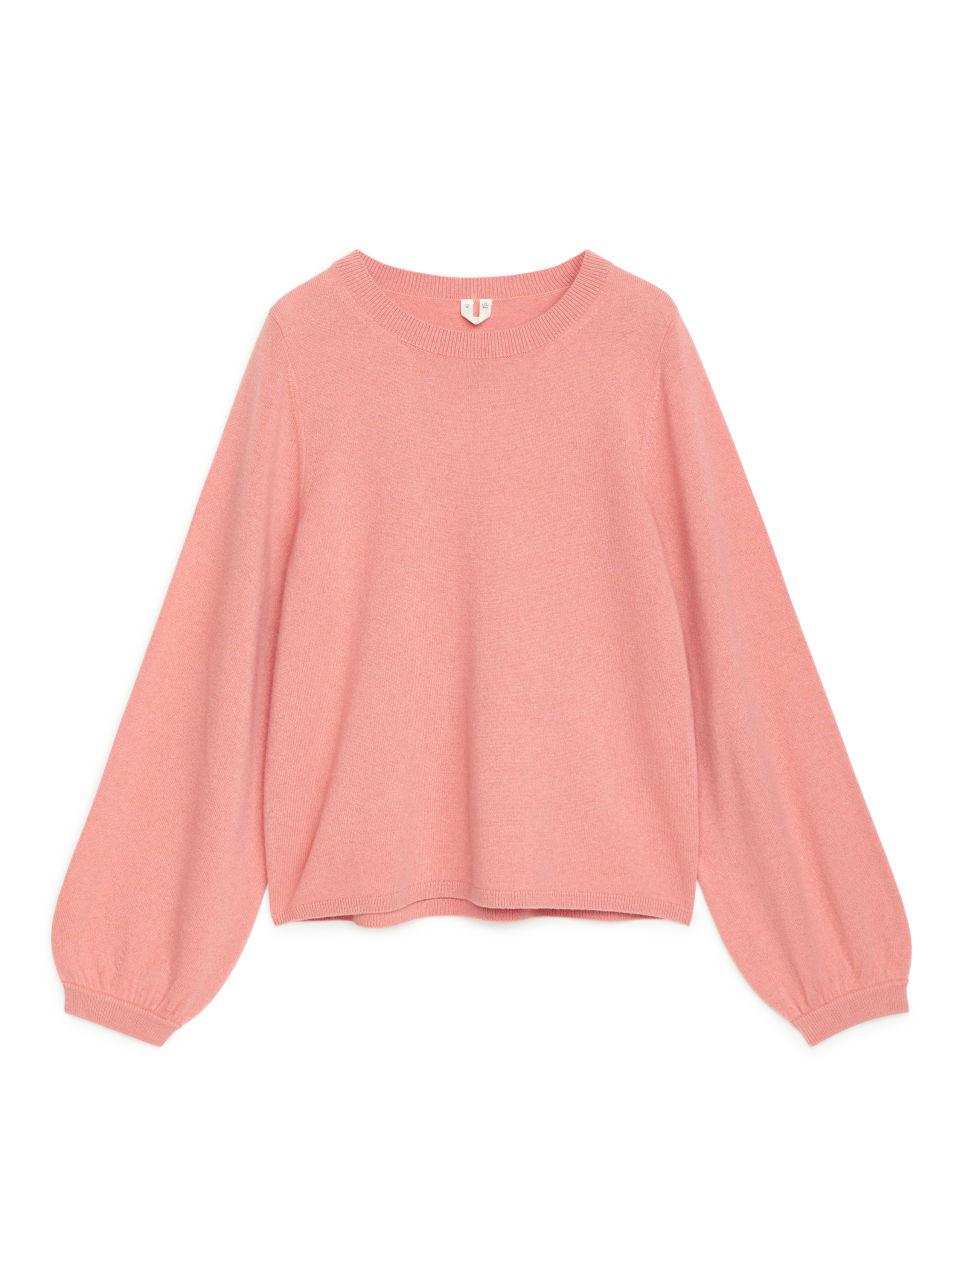 Bell Sleeve Cashmere Jumper - Pink